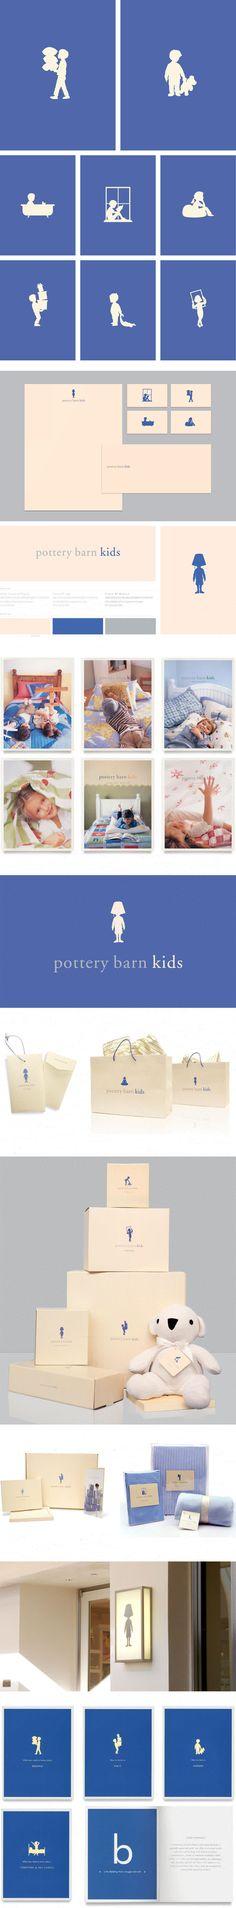 Pottery Barn Kids #packaging #branding #marketing PD